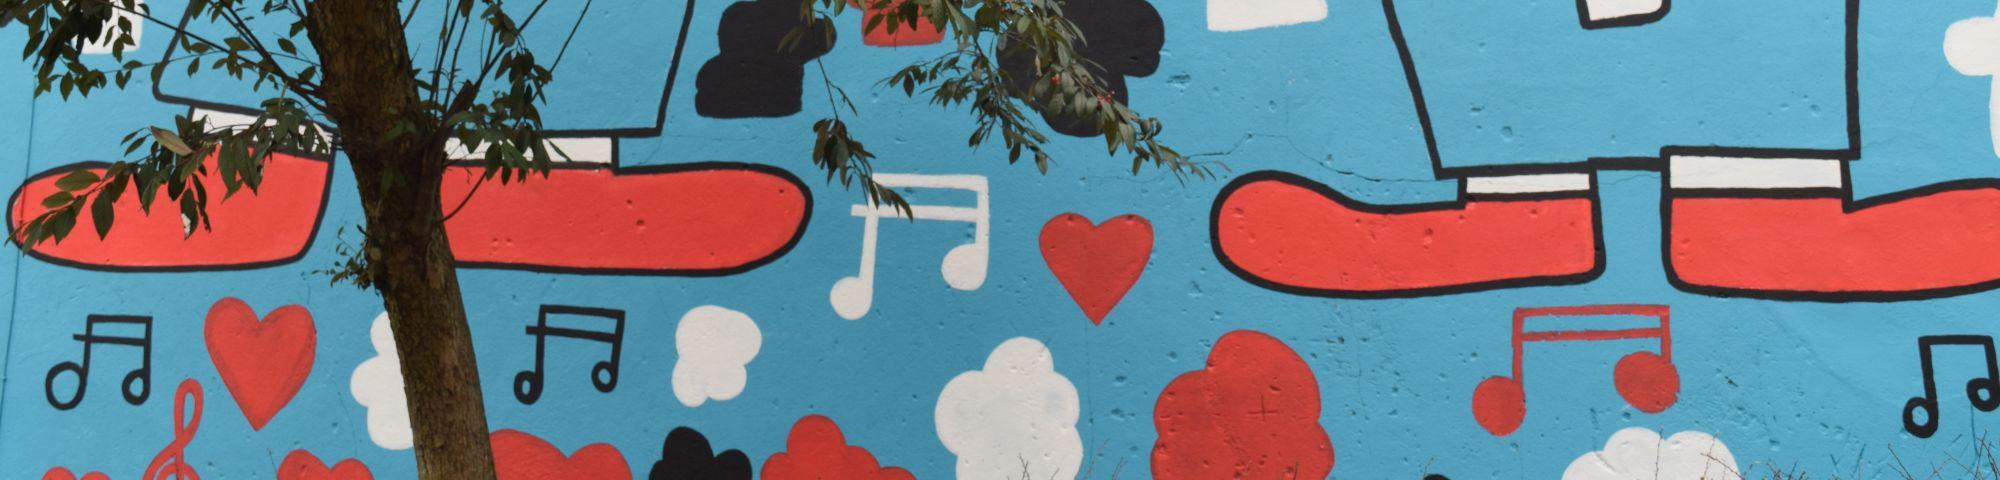 Peckham mural